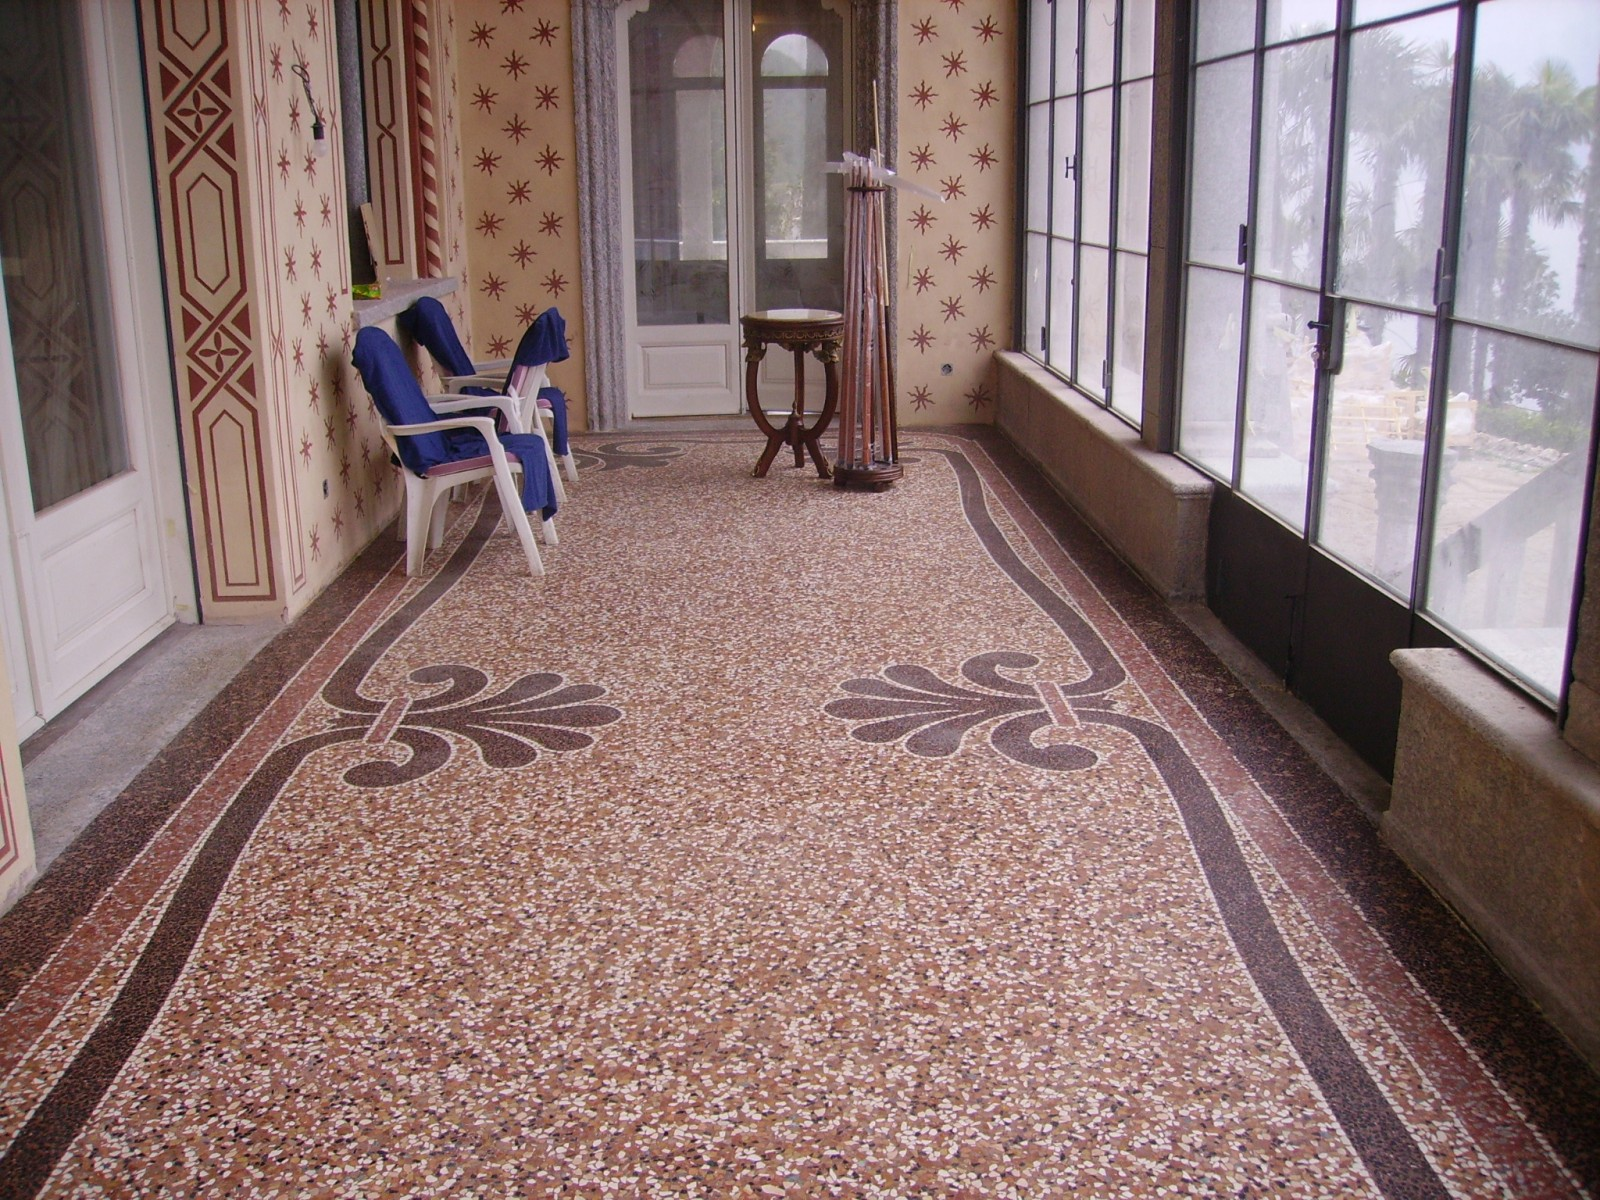 Milgem | Marmi Milano - Mosaico e Seminato